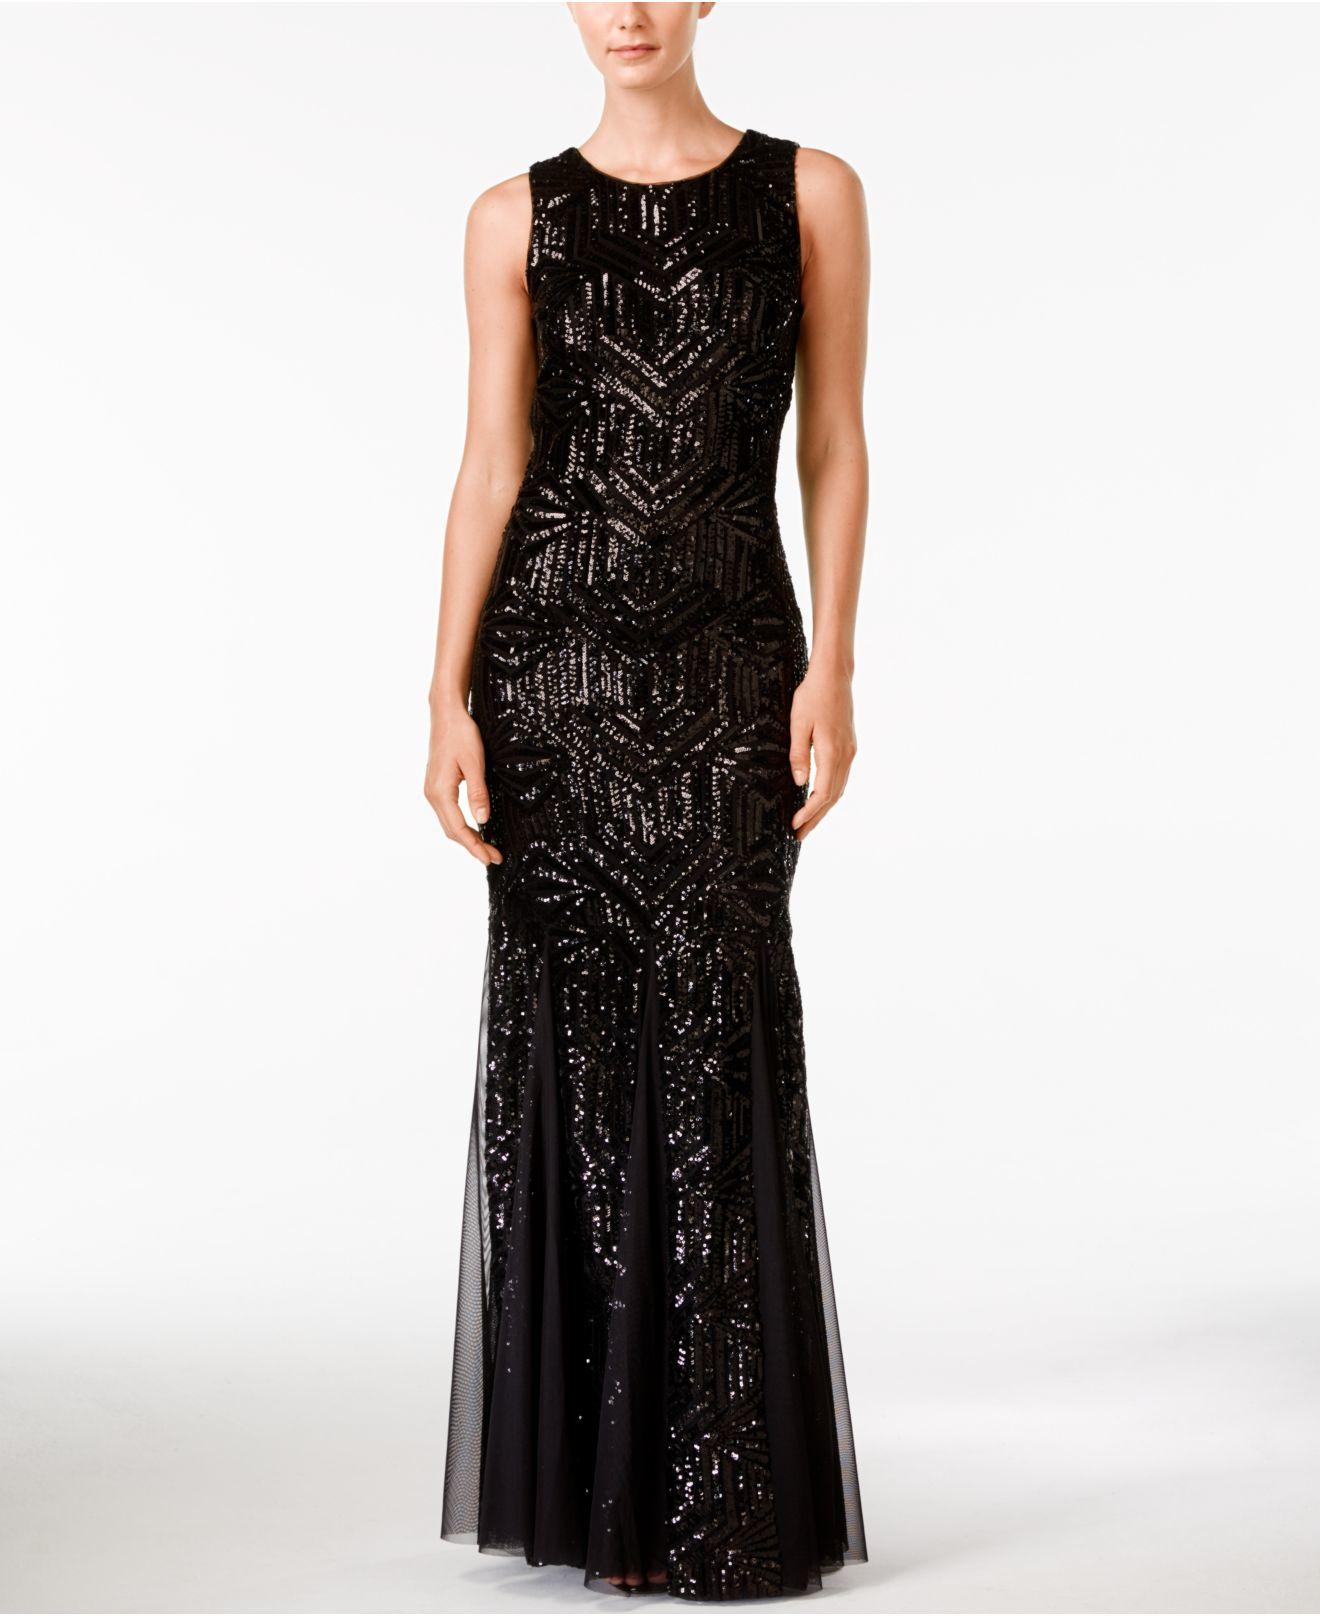 9916c916fe49 Calvin Klein Sequined Sleeveless Mermaid Gown in Black - Lyst